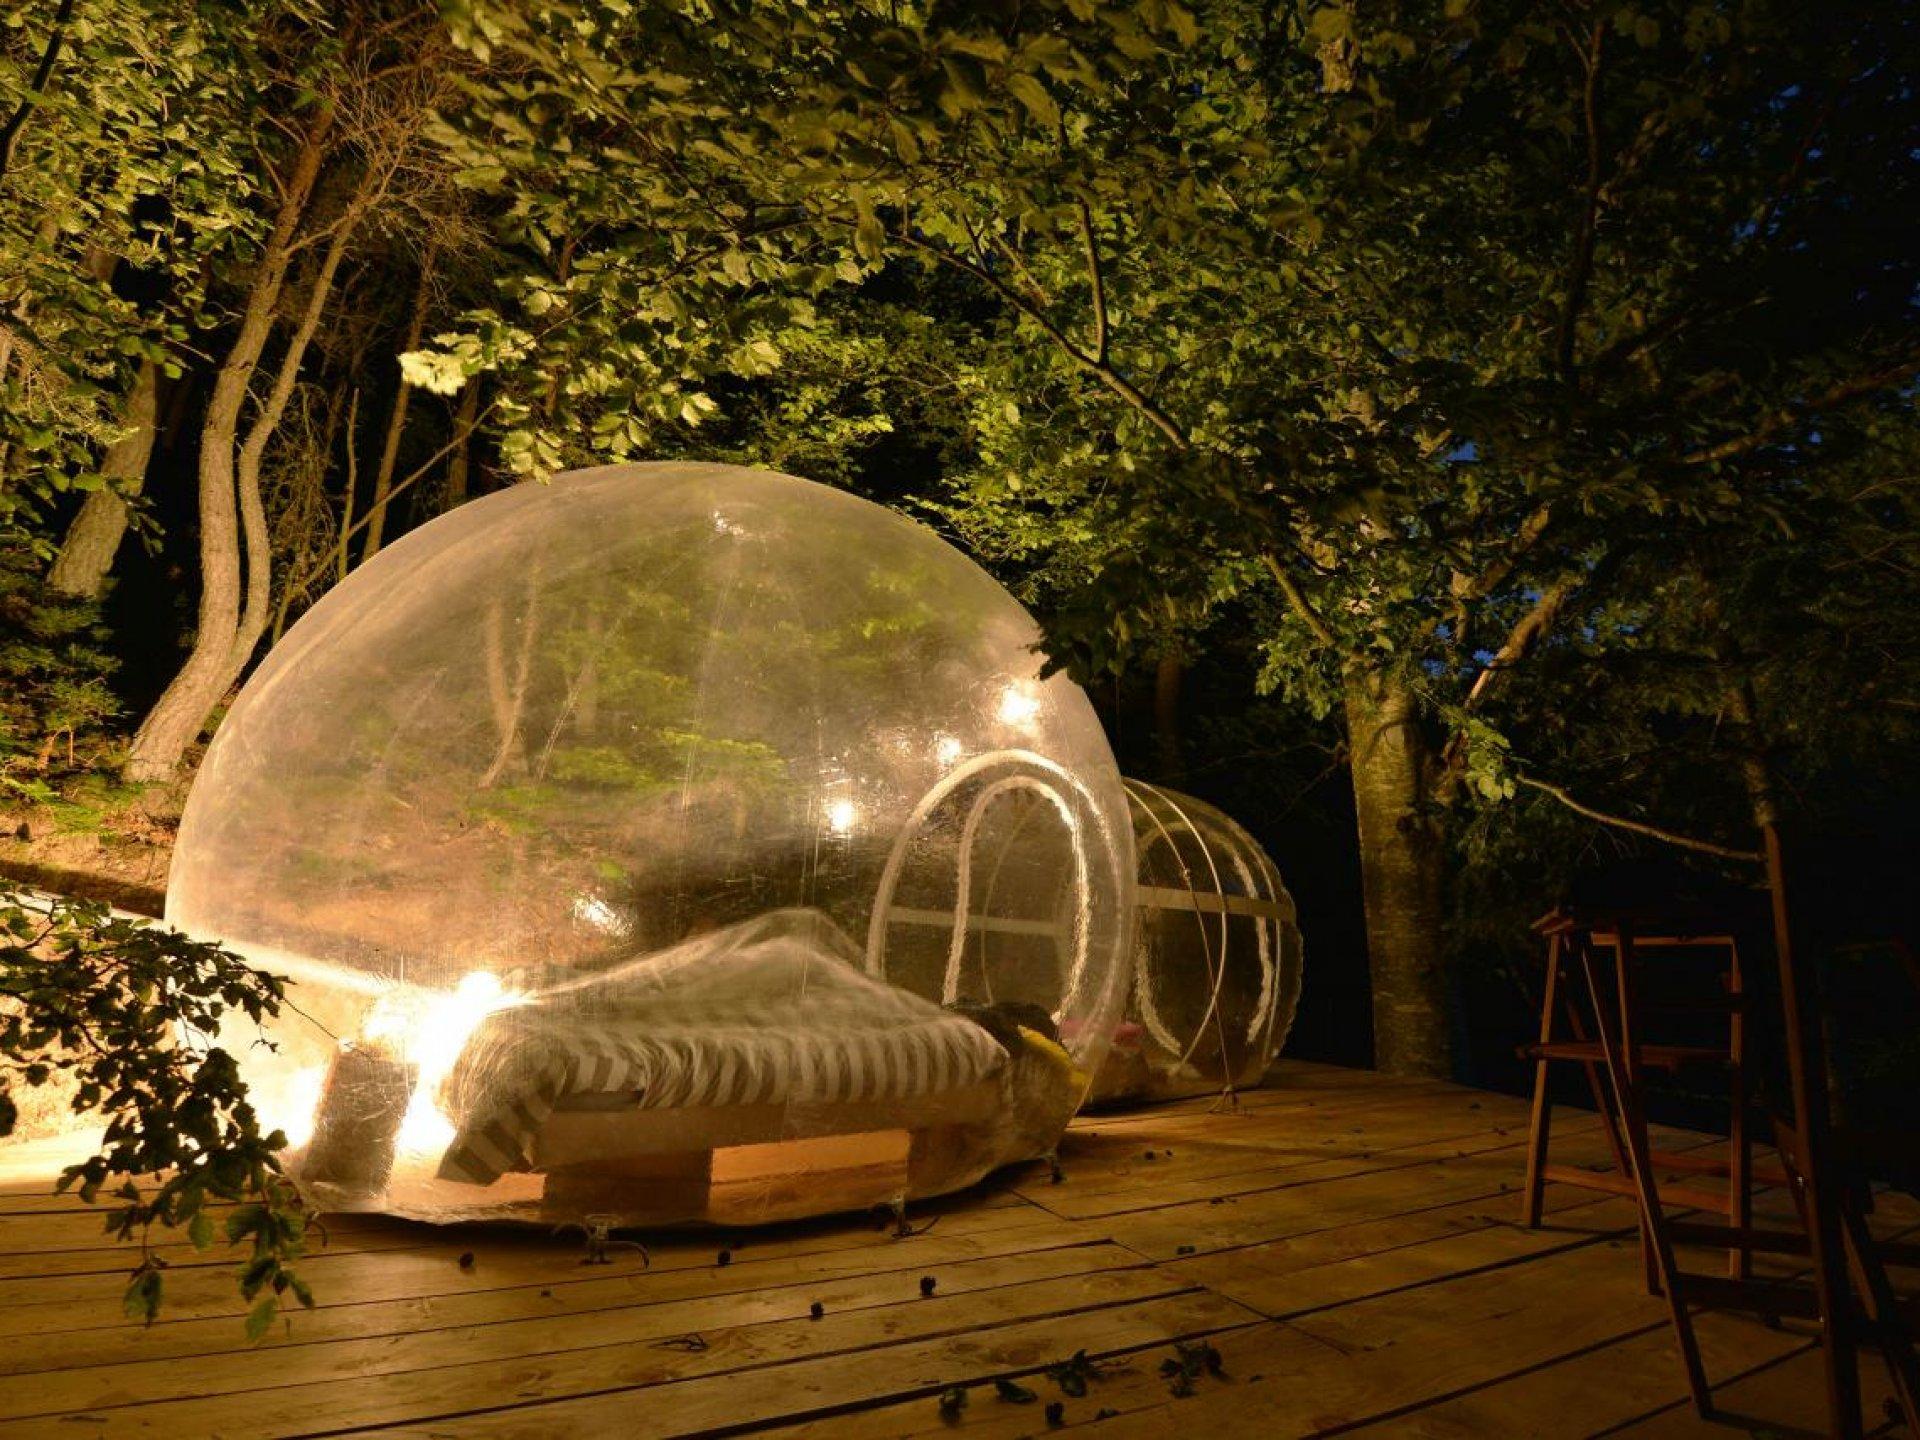 Week End Bulle Transparente Bretagne petite bulle transparente n°1 - idées de weekend insolite